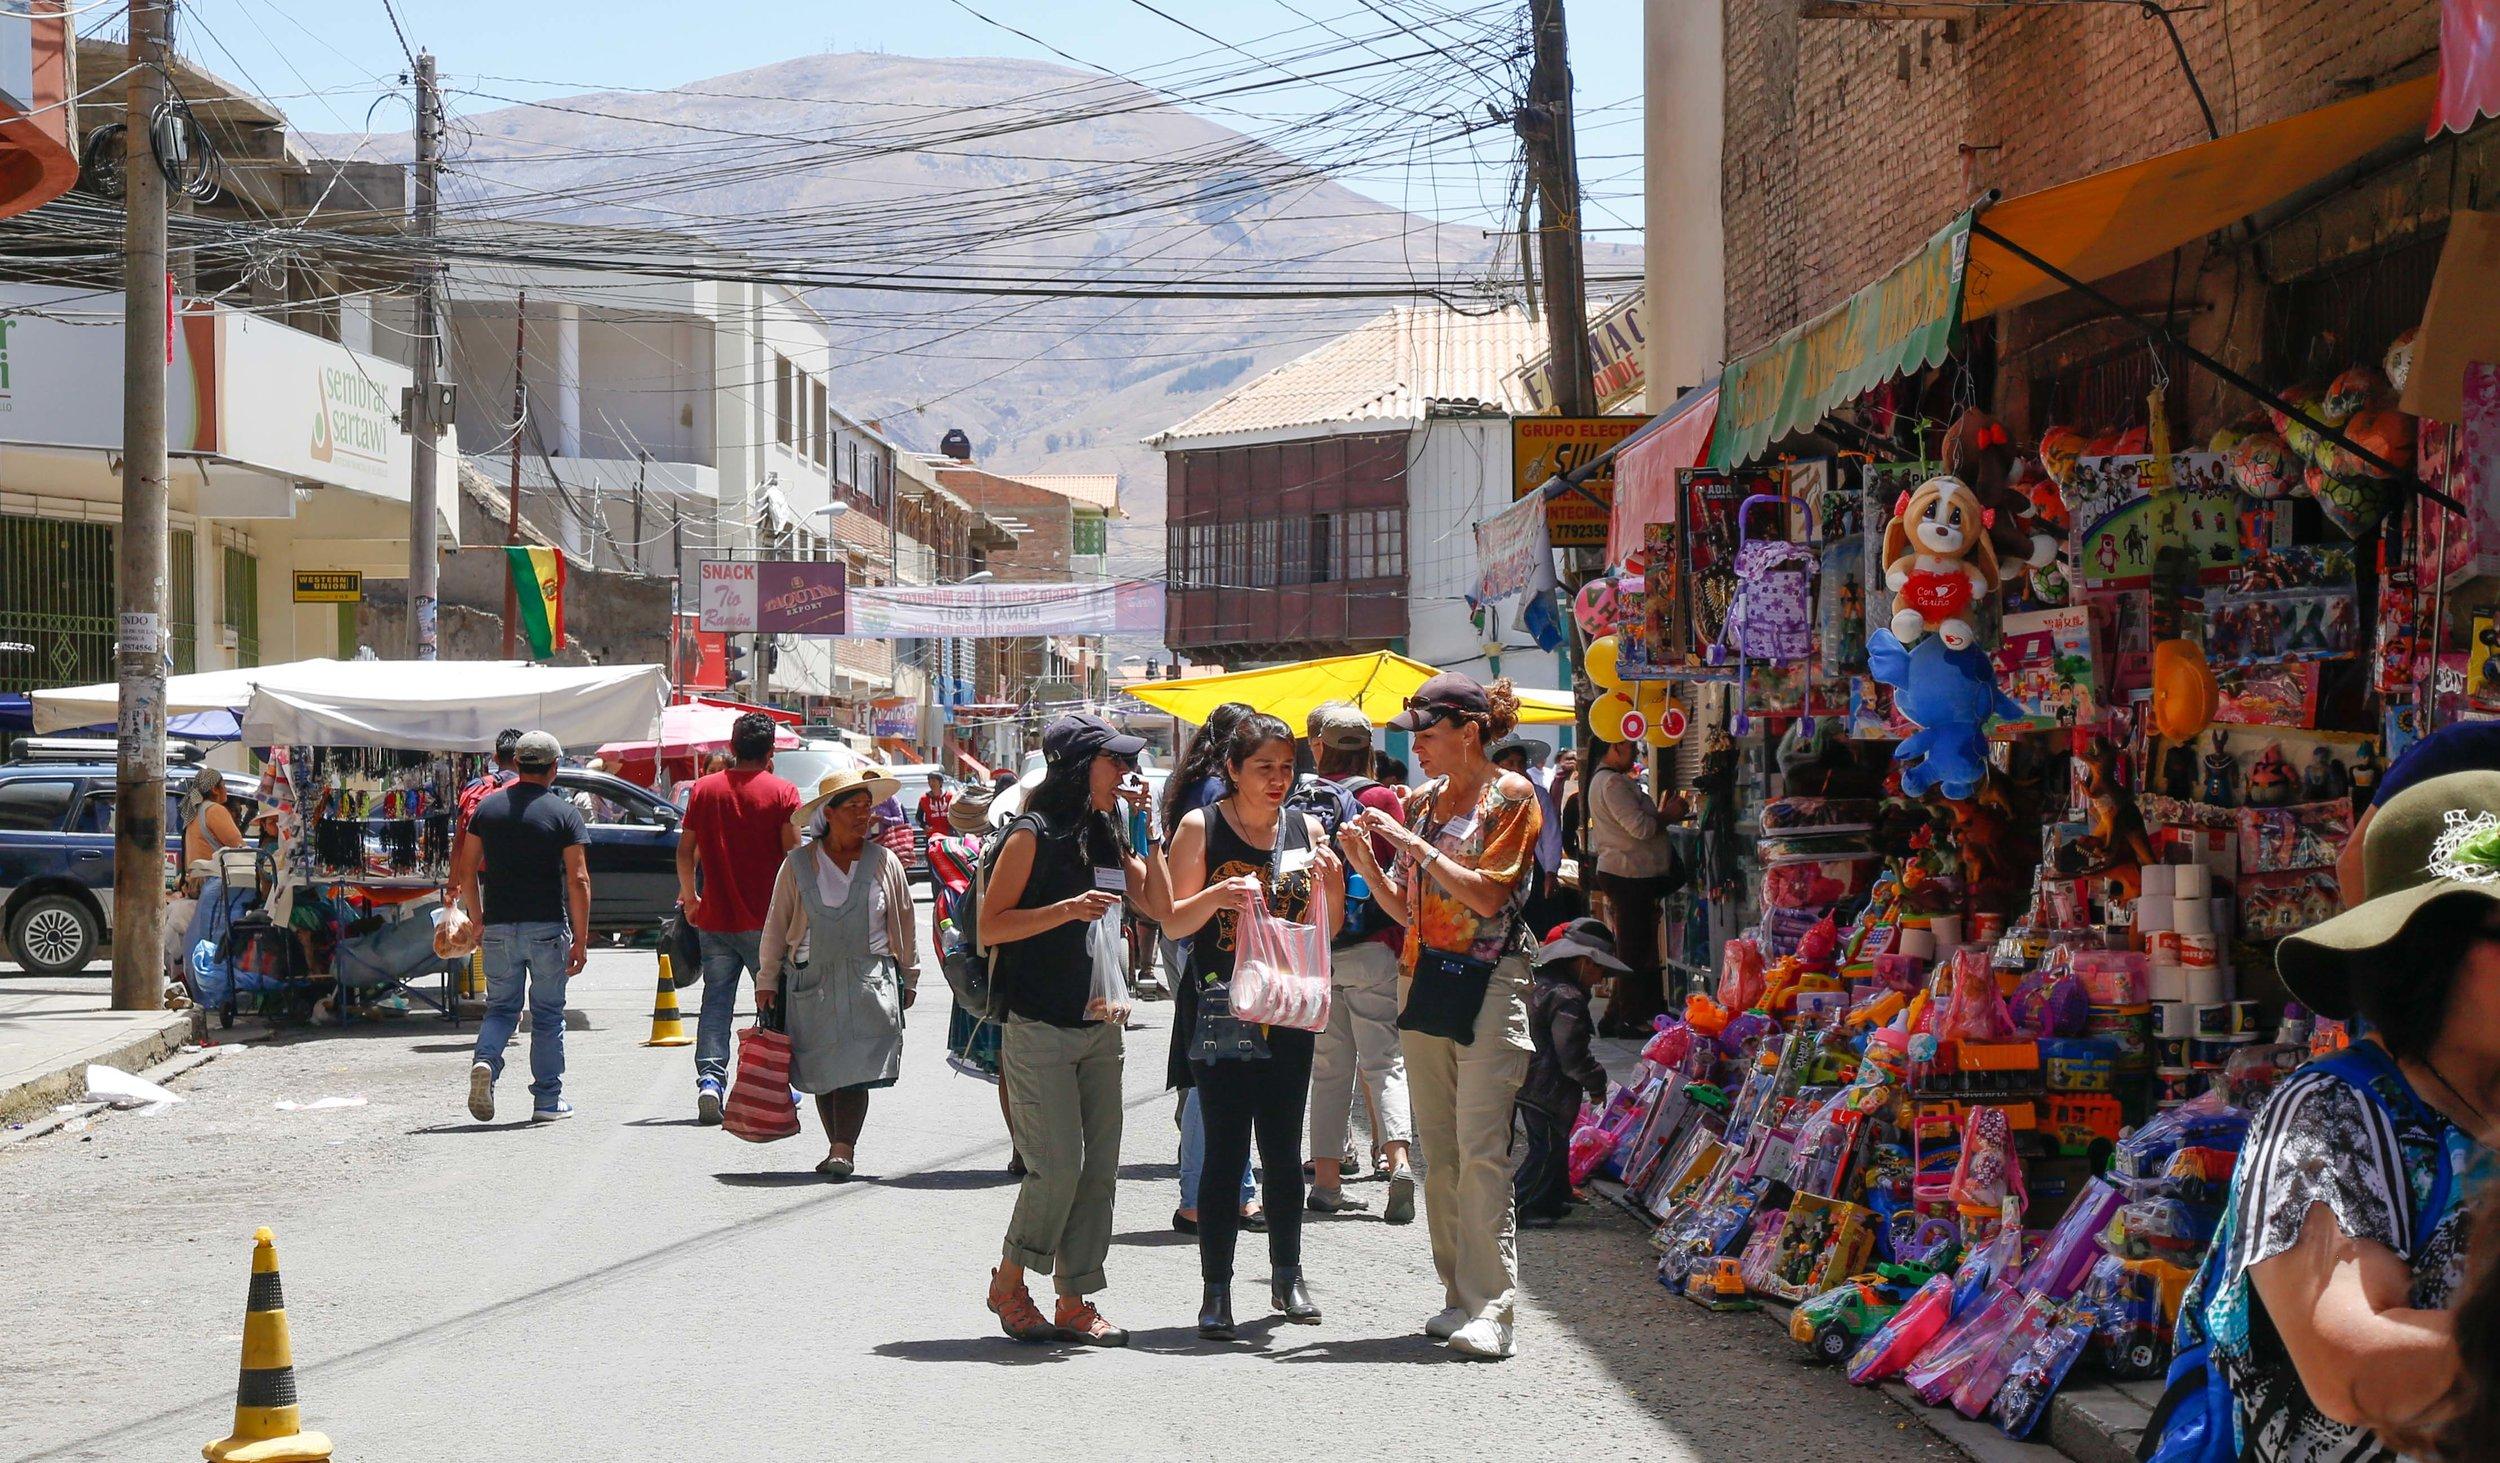 Taking a Tour of Punata, Bolivia